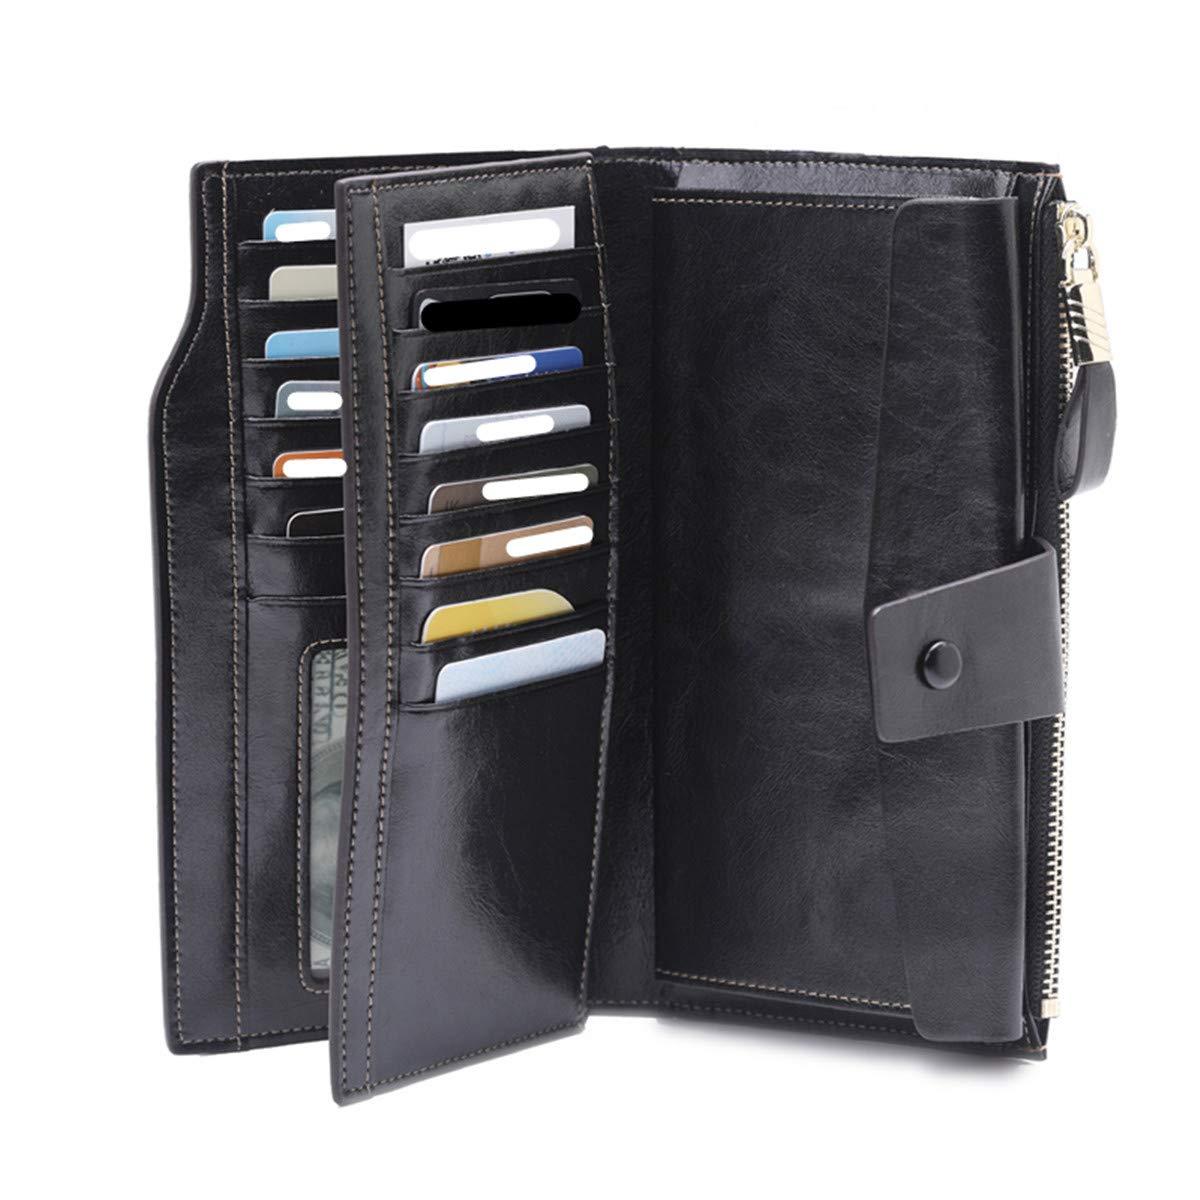 59bd42e7acfb LJYH Women's Cowhide Leather Wallet Card Case Clutch Wristlet Bag ...